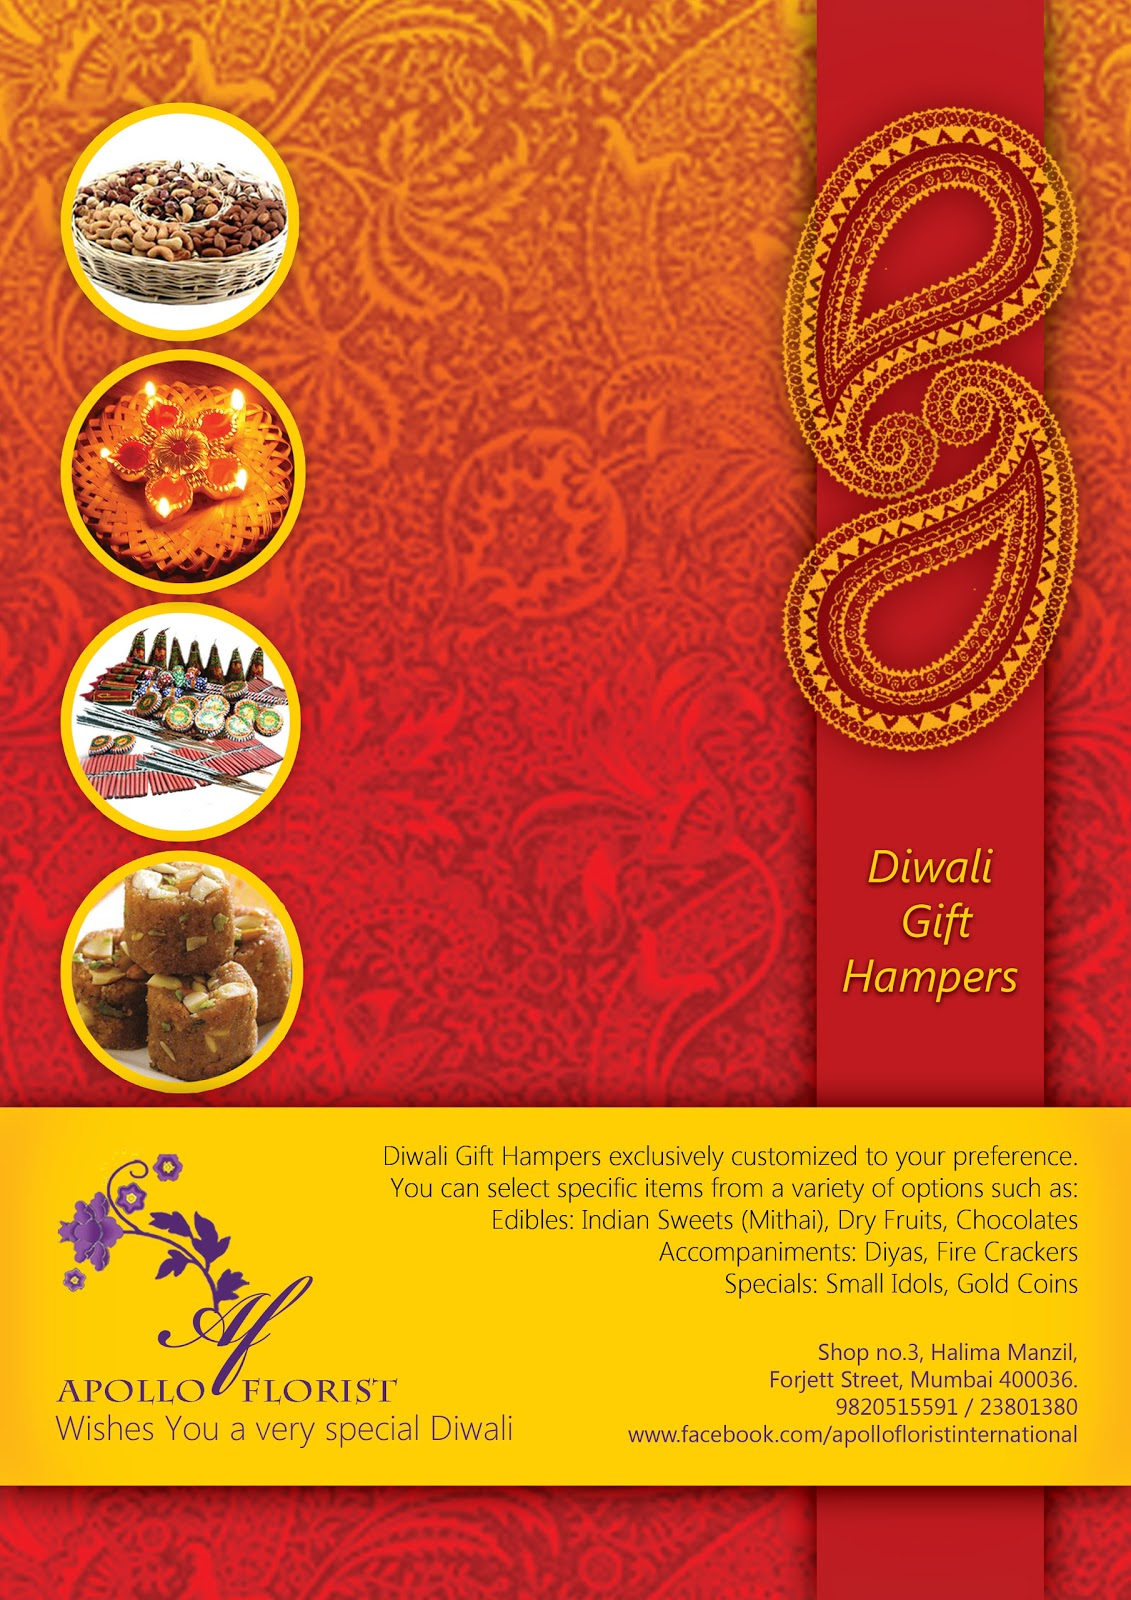 My Arena Diwali Flyer For Apollo Florist